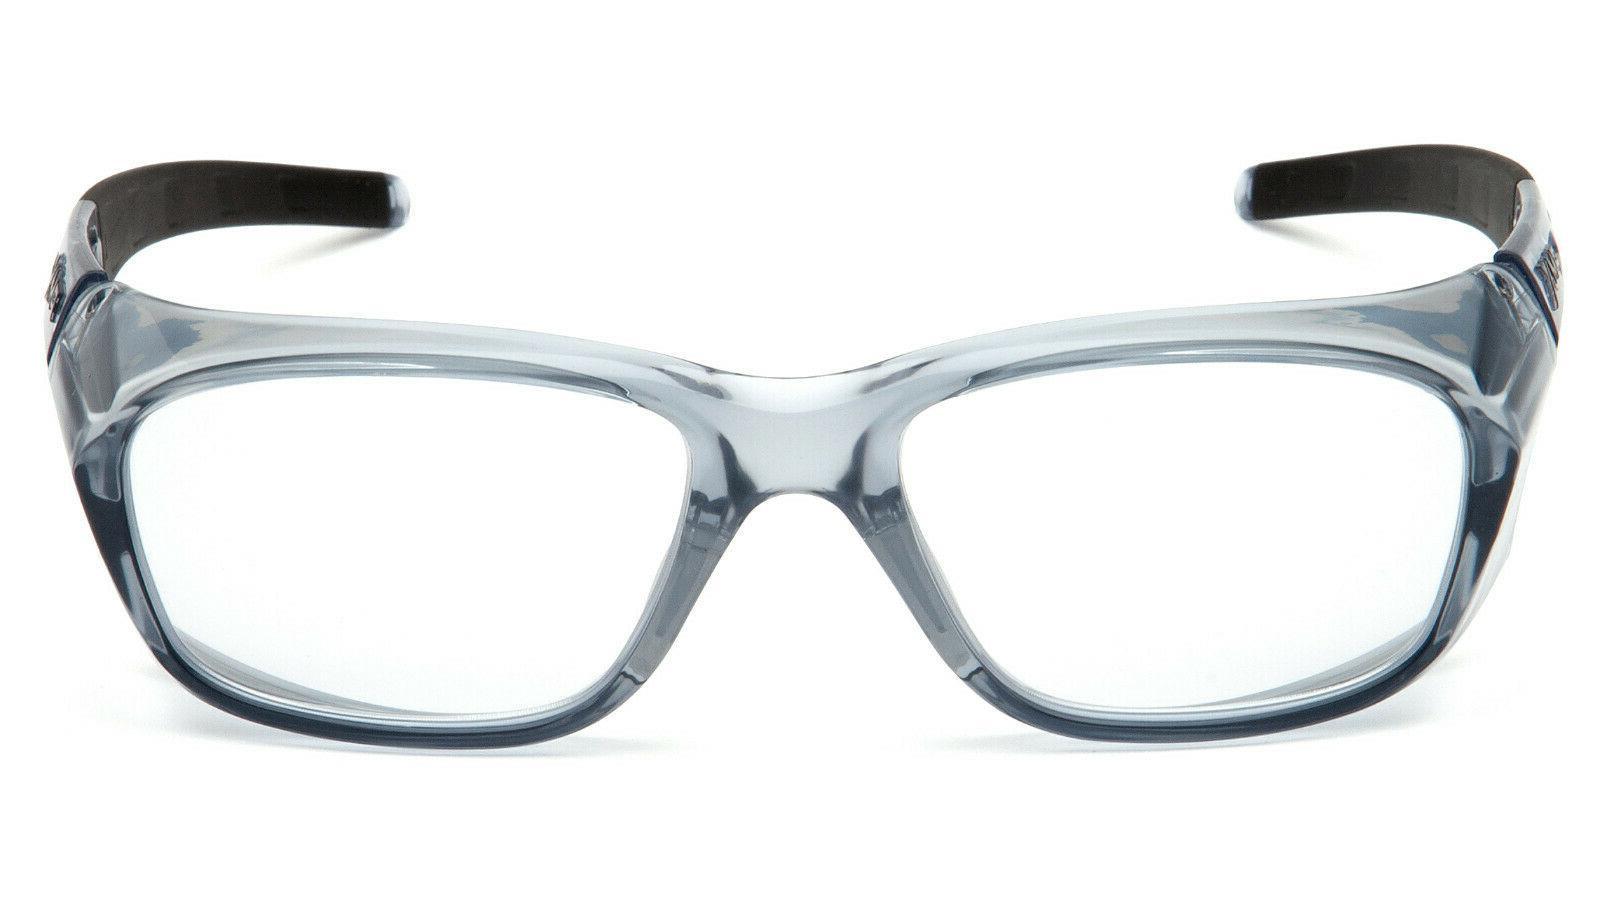 Pyramex Full Reader Gray Reading Glasses Z87+